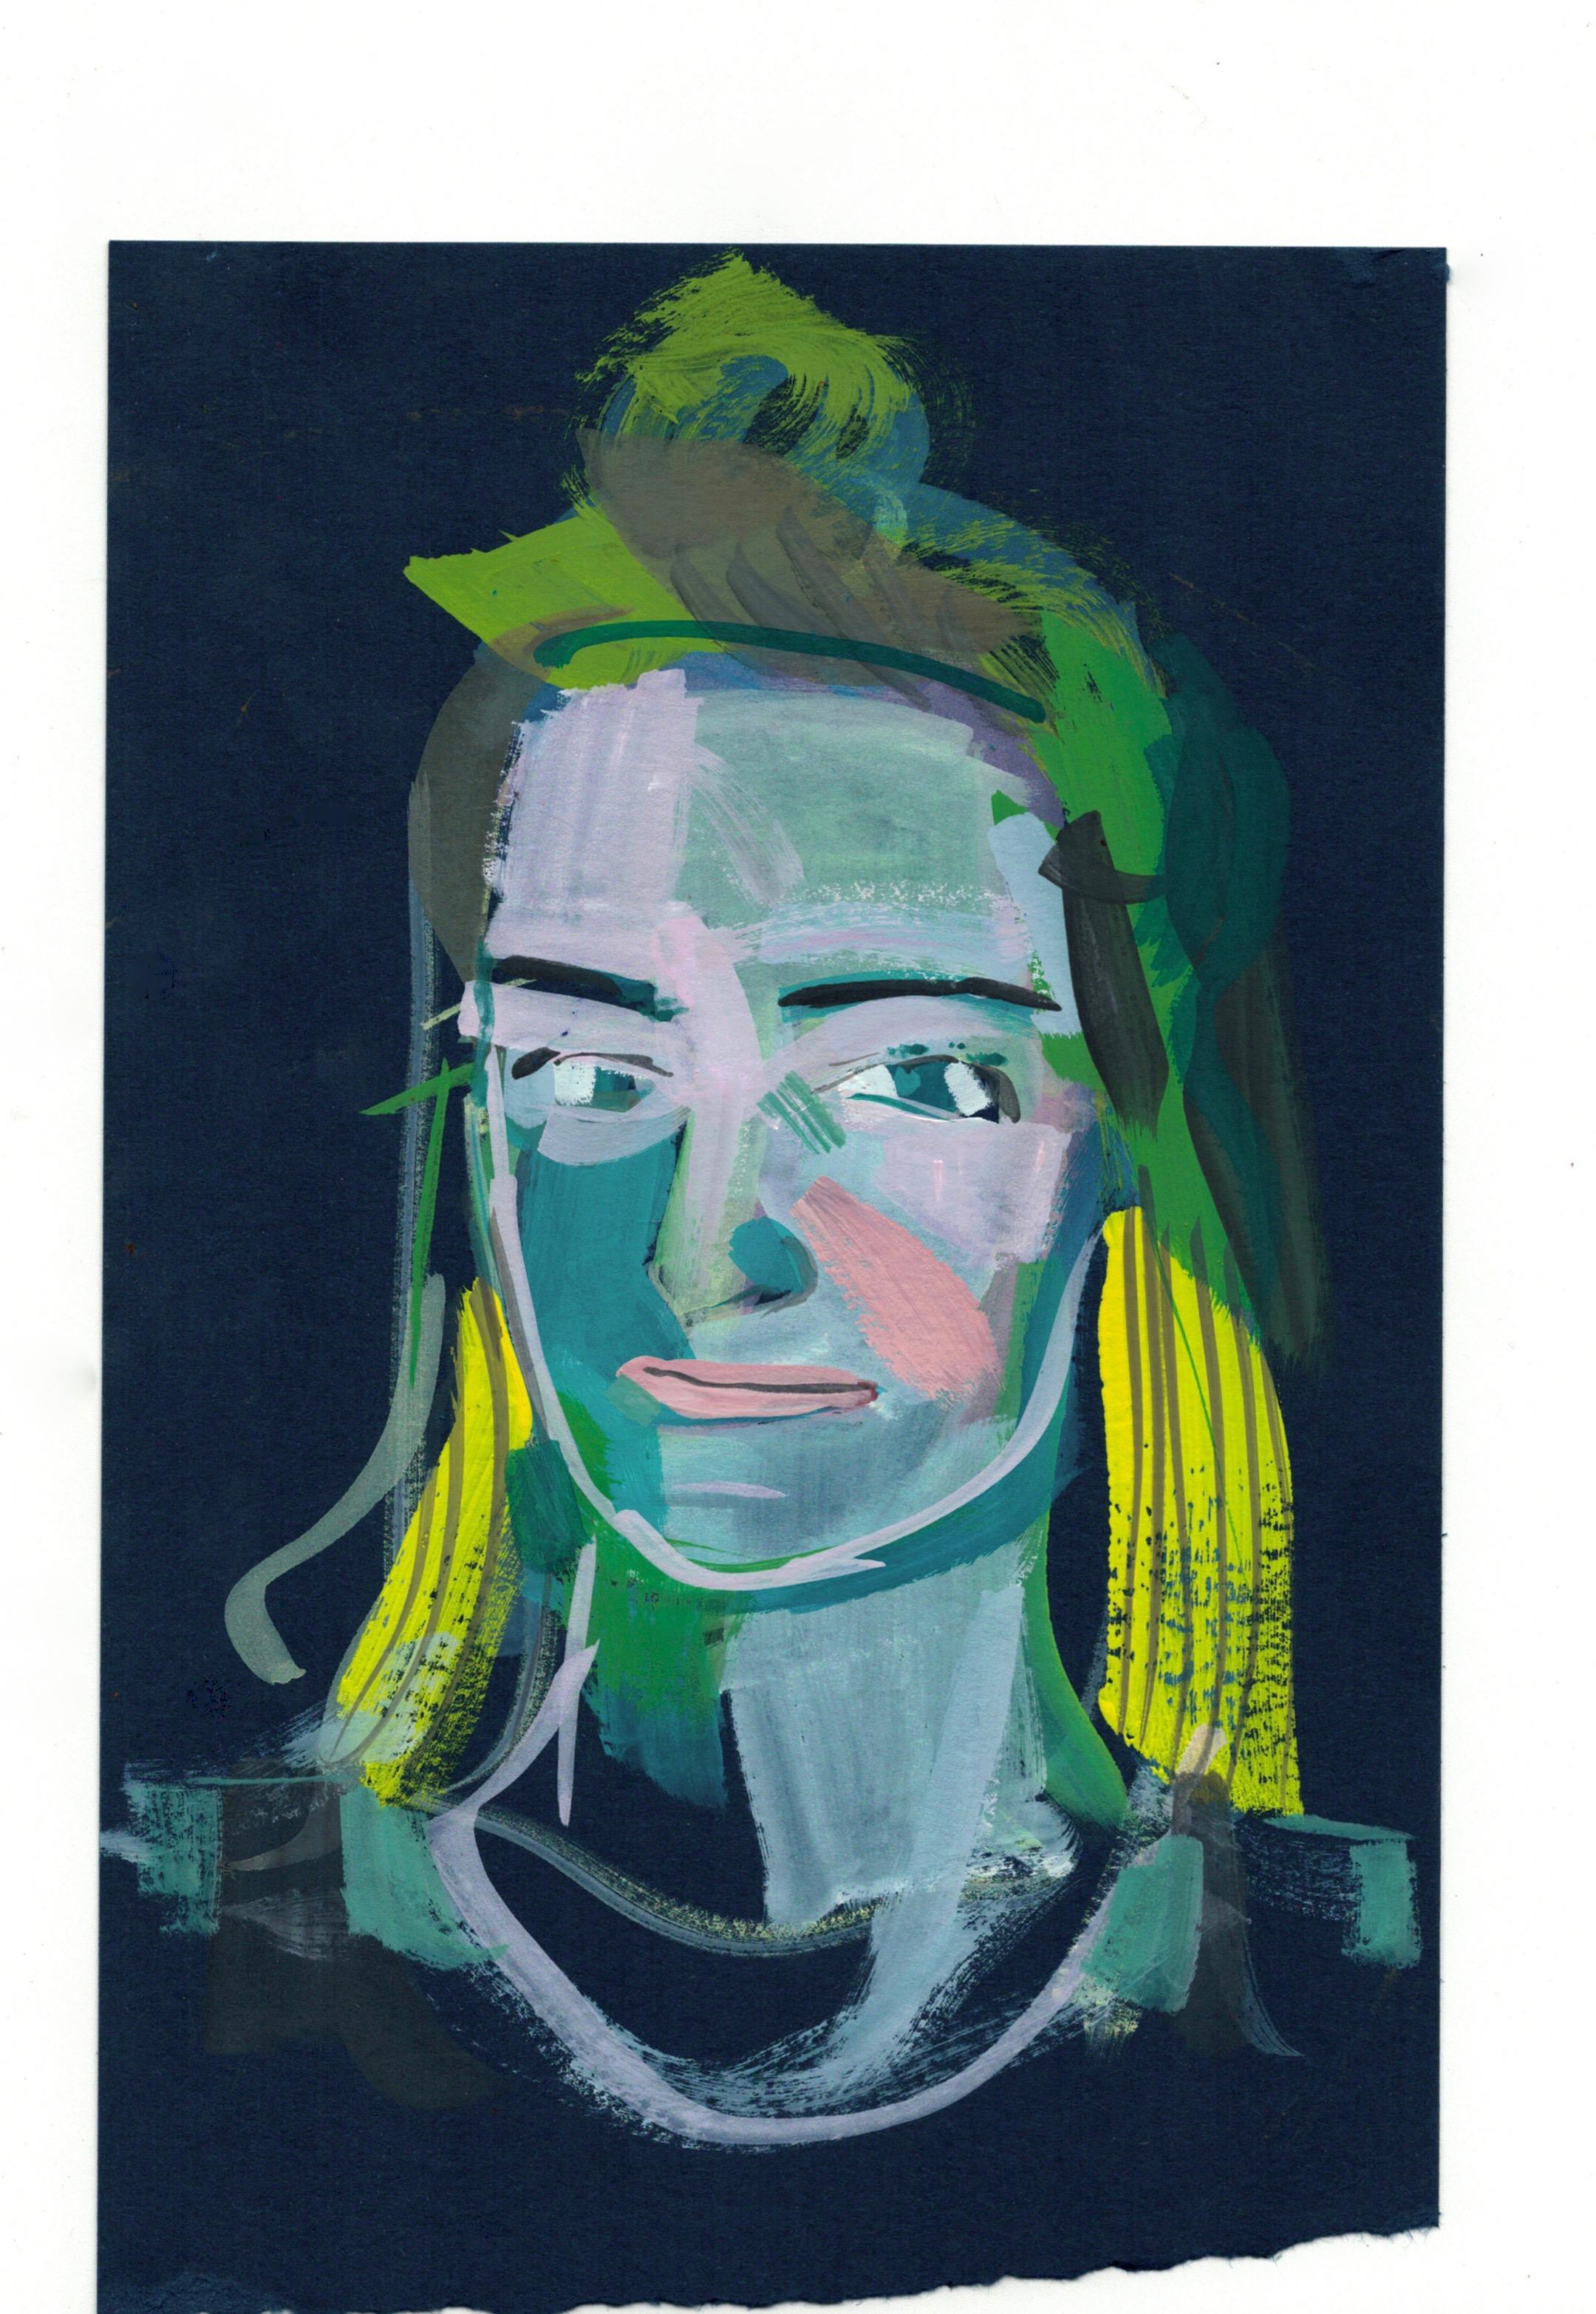 NOEL DANFORTH Portrait by Lisa Luck, artist and illustrator  @daughtersandsuns